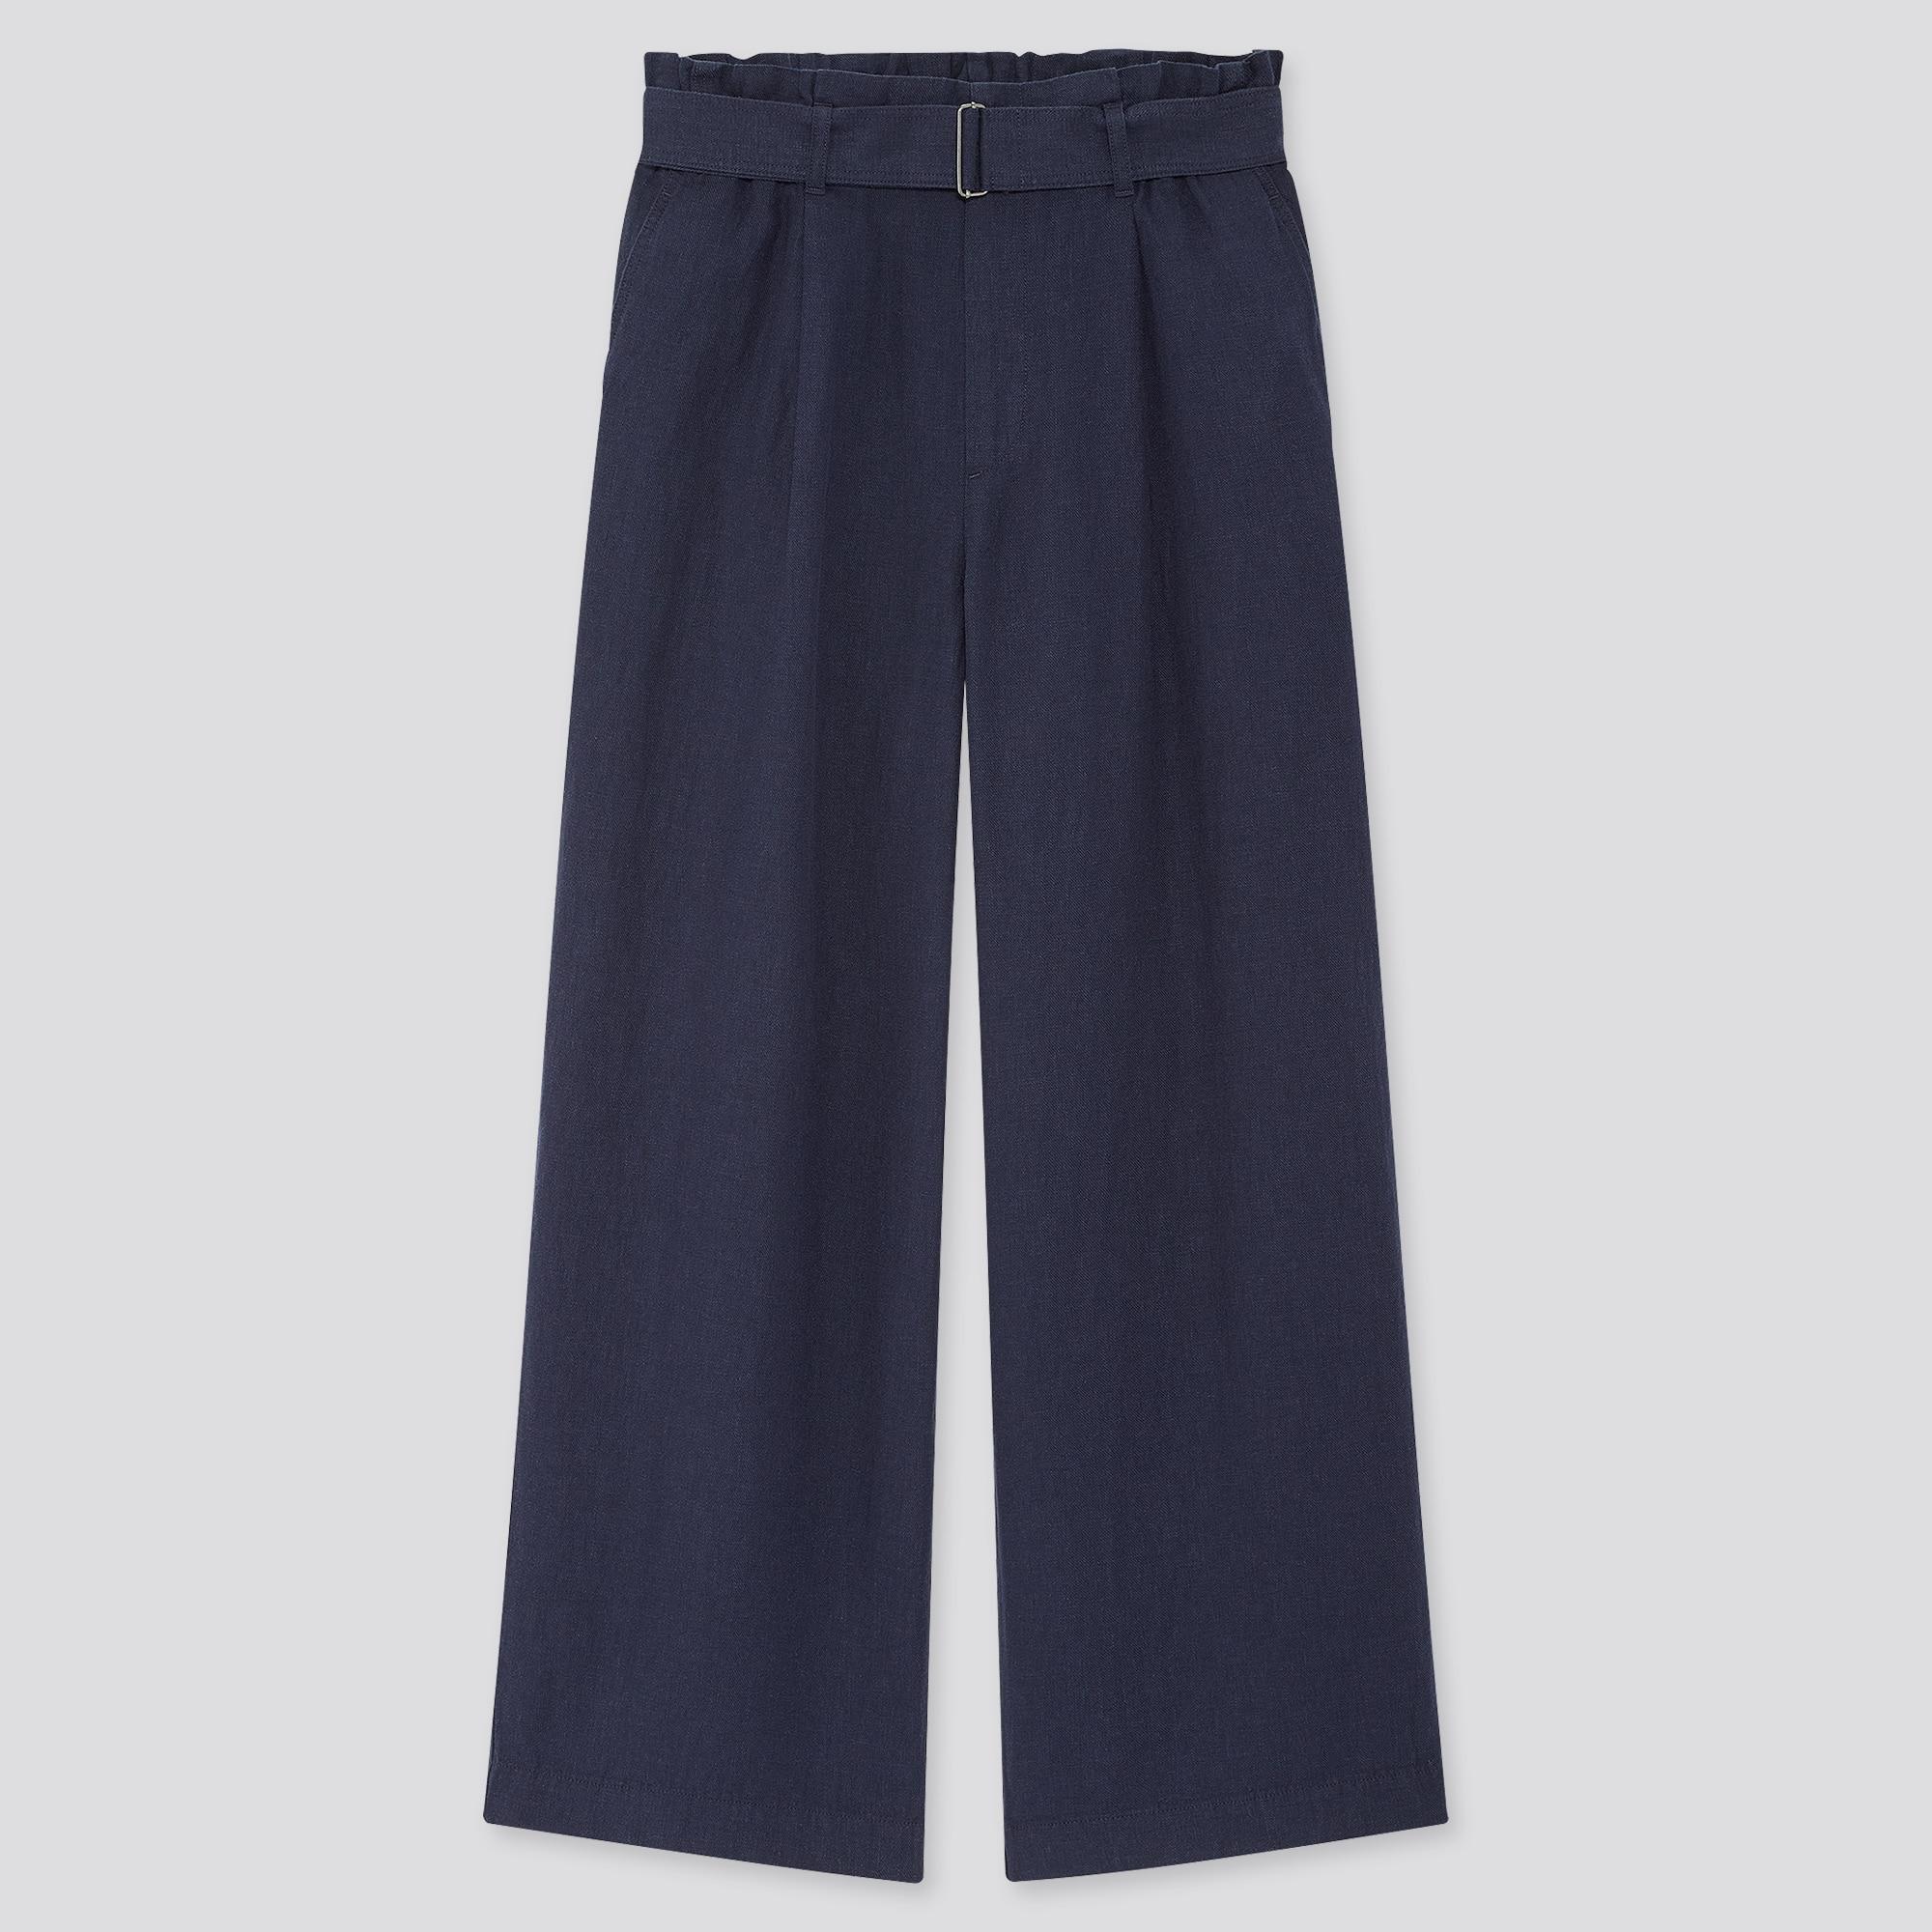 WOMEN BELTED LINEN RAYON WIDE PANTS